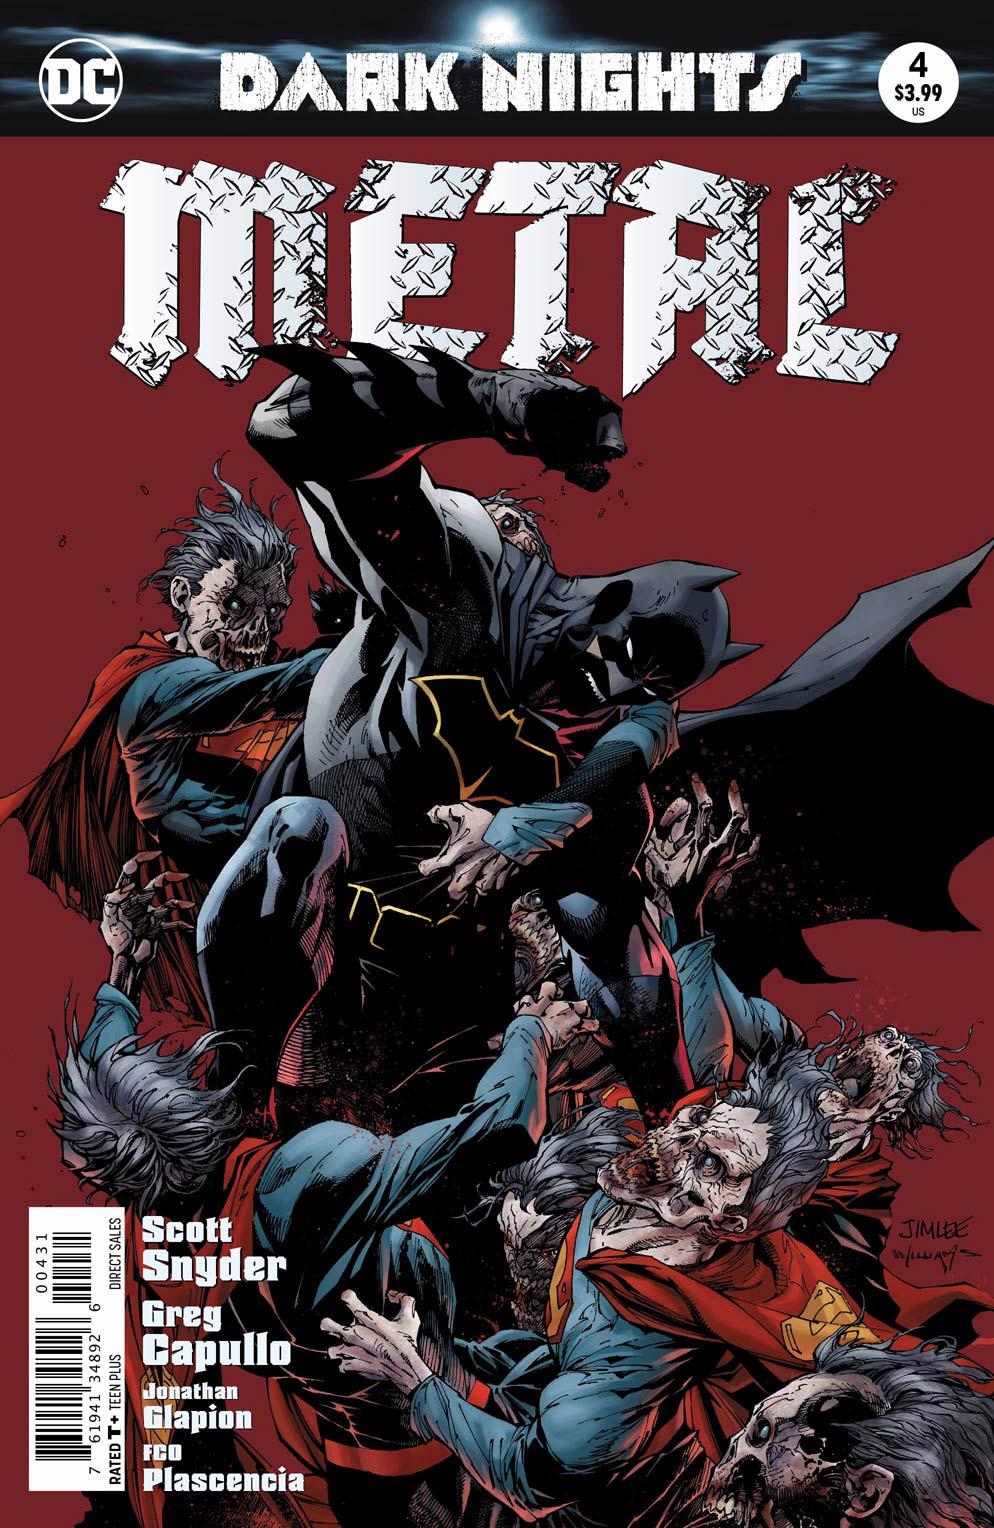 Dark Nights Metal 4 Variant - DC Comics News